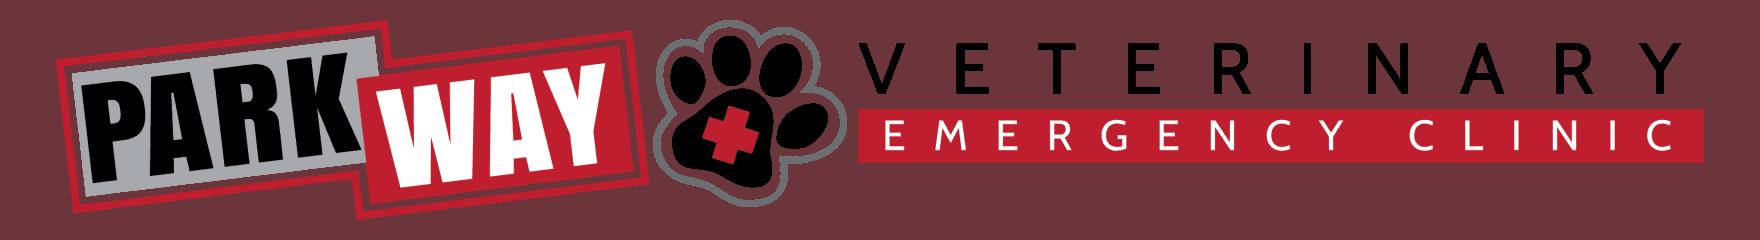 parkway veterinary emergency clinic